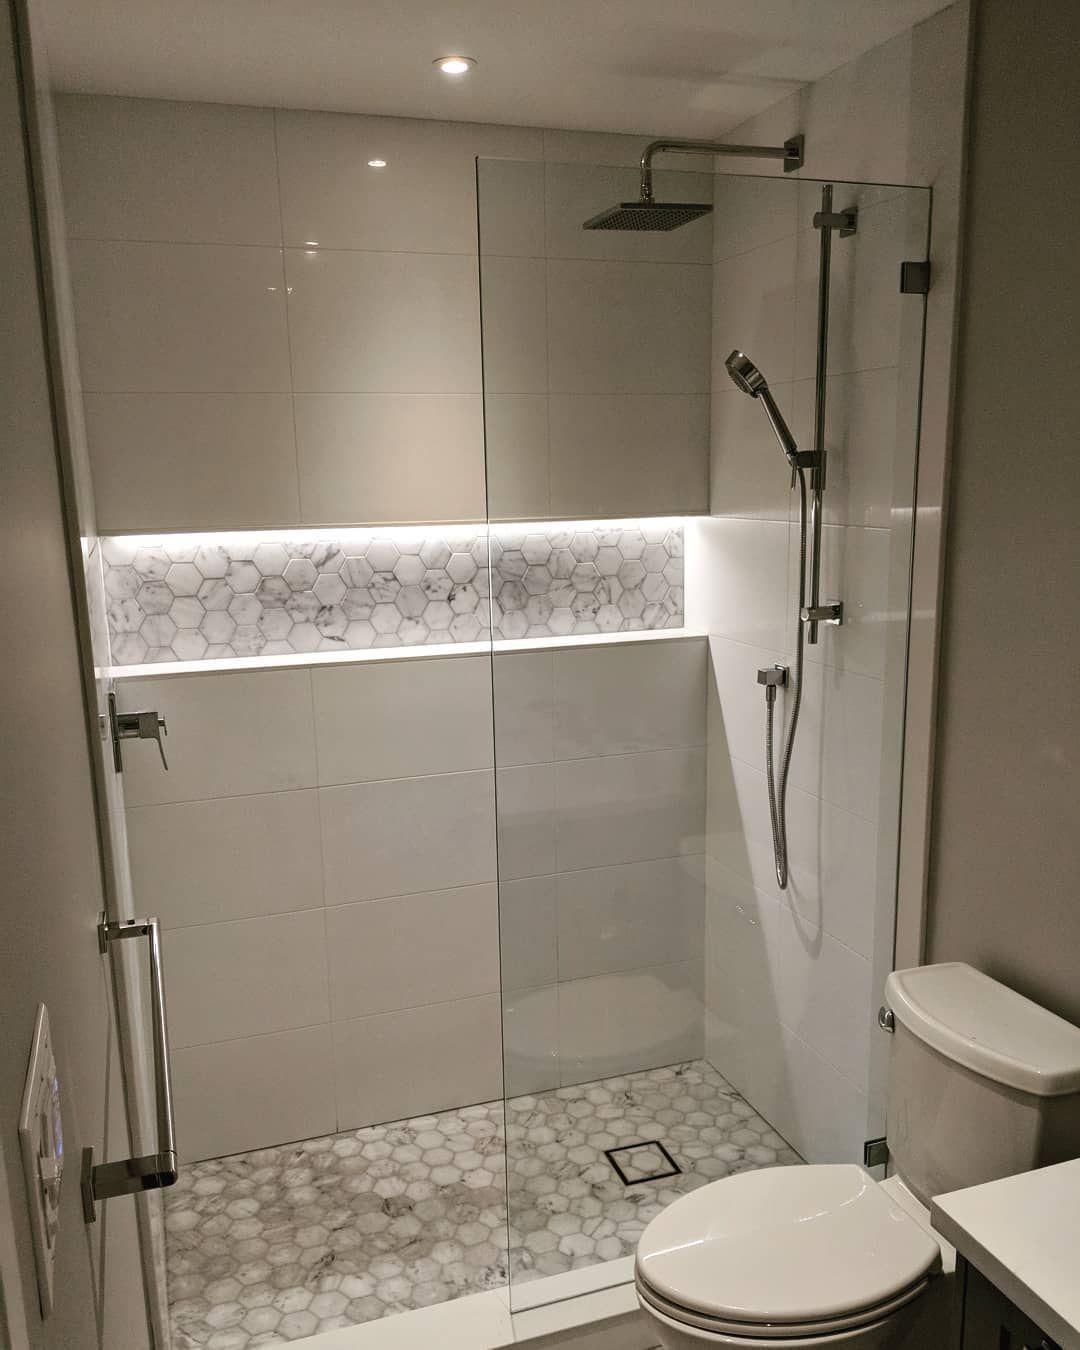 19 Excellent Modern Bathroom Remodel Budget Ideas In 2020 Shower Remodel Simple Bathroom Remodel Modern Bathroom Remodel